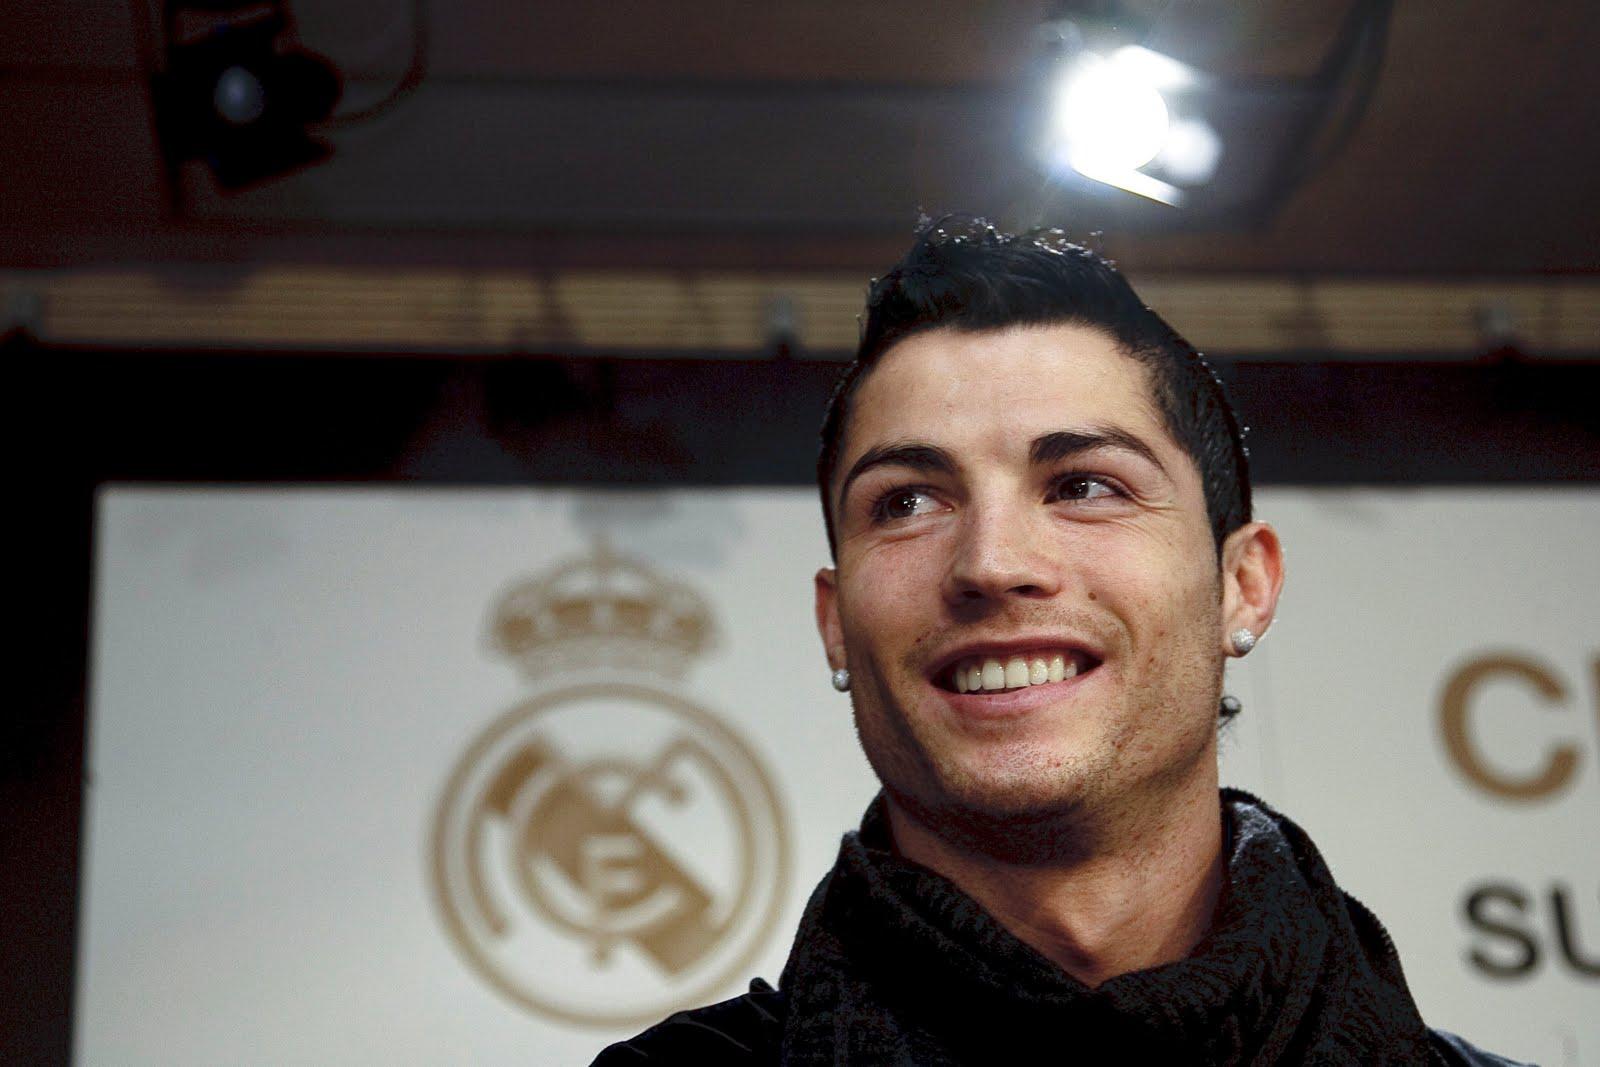 http://4.bp.blogspot.com/_6A8j2EQmANk/S8wZc_76C2I/AAAAAAAACXY/hwsdiJqxfoA/s1600/Cristiano+Ronaldo6.jpg